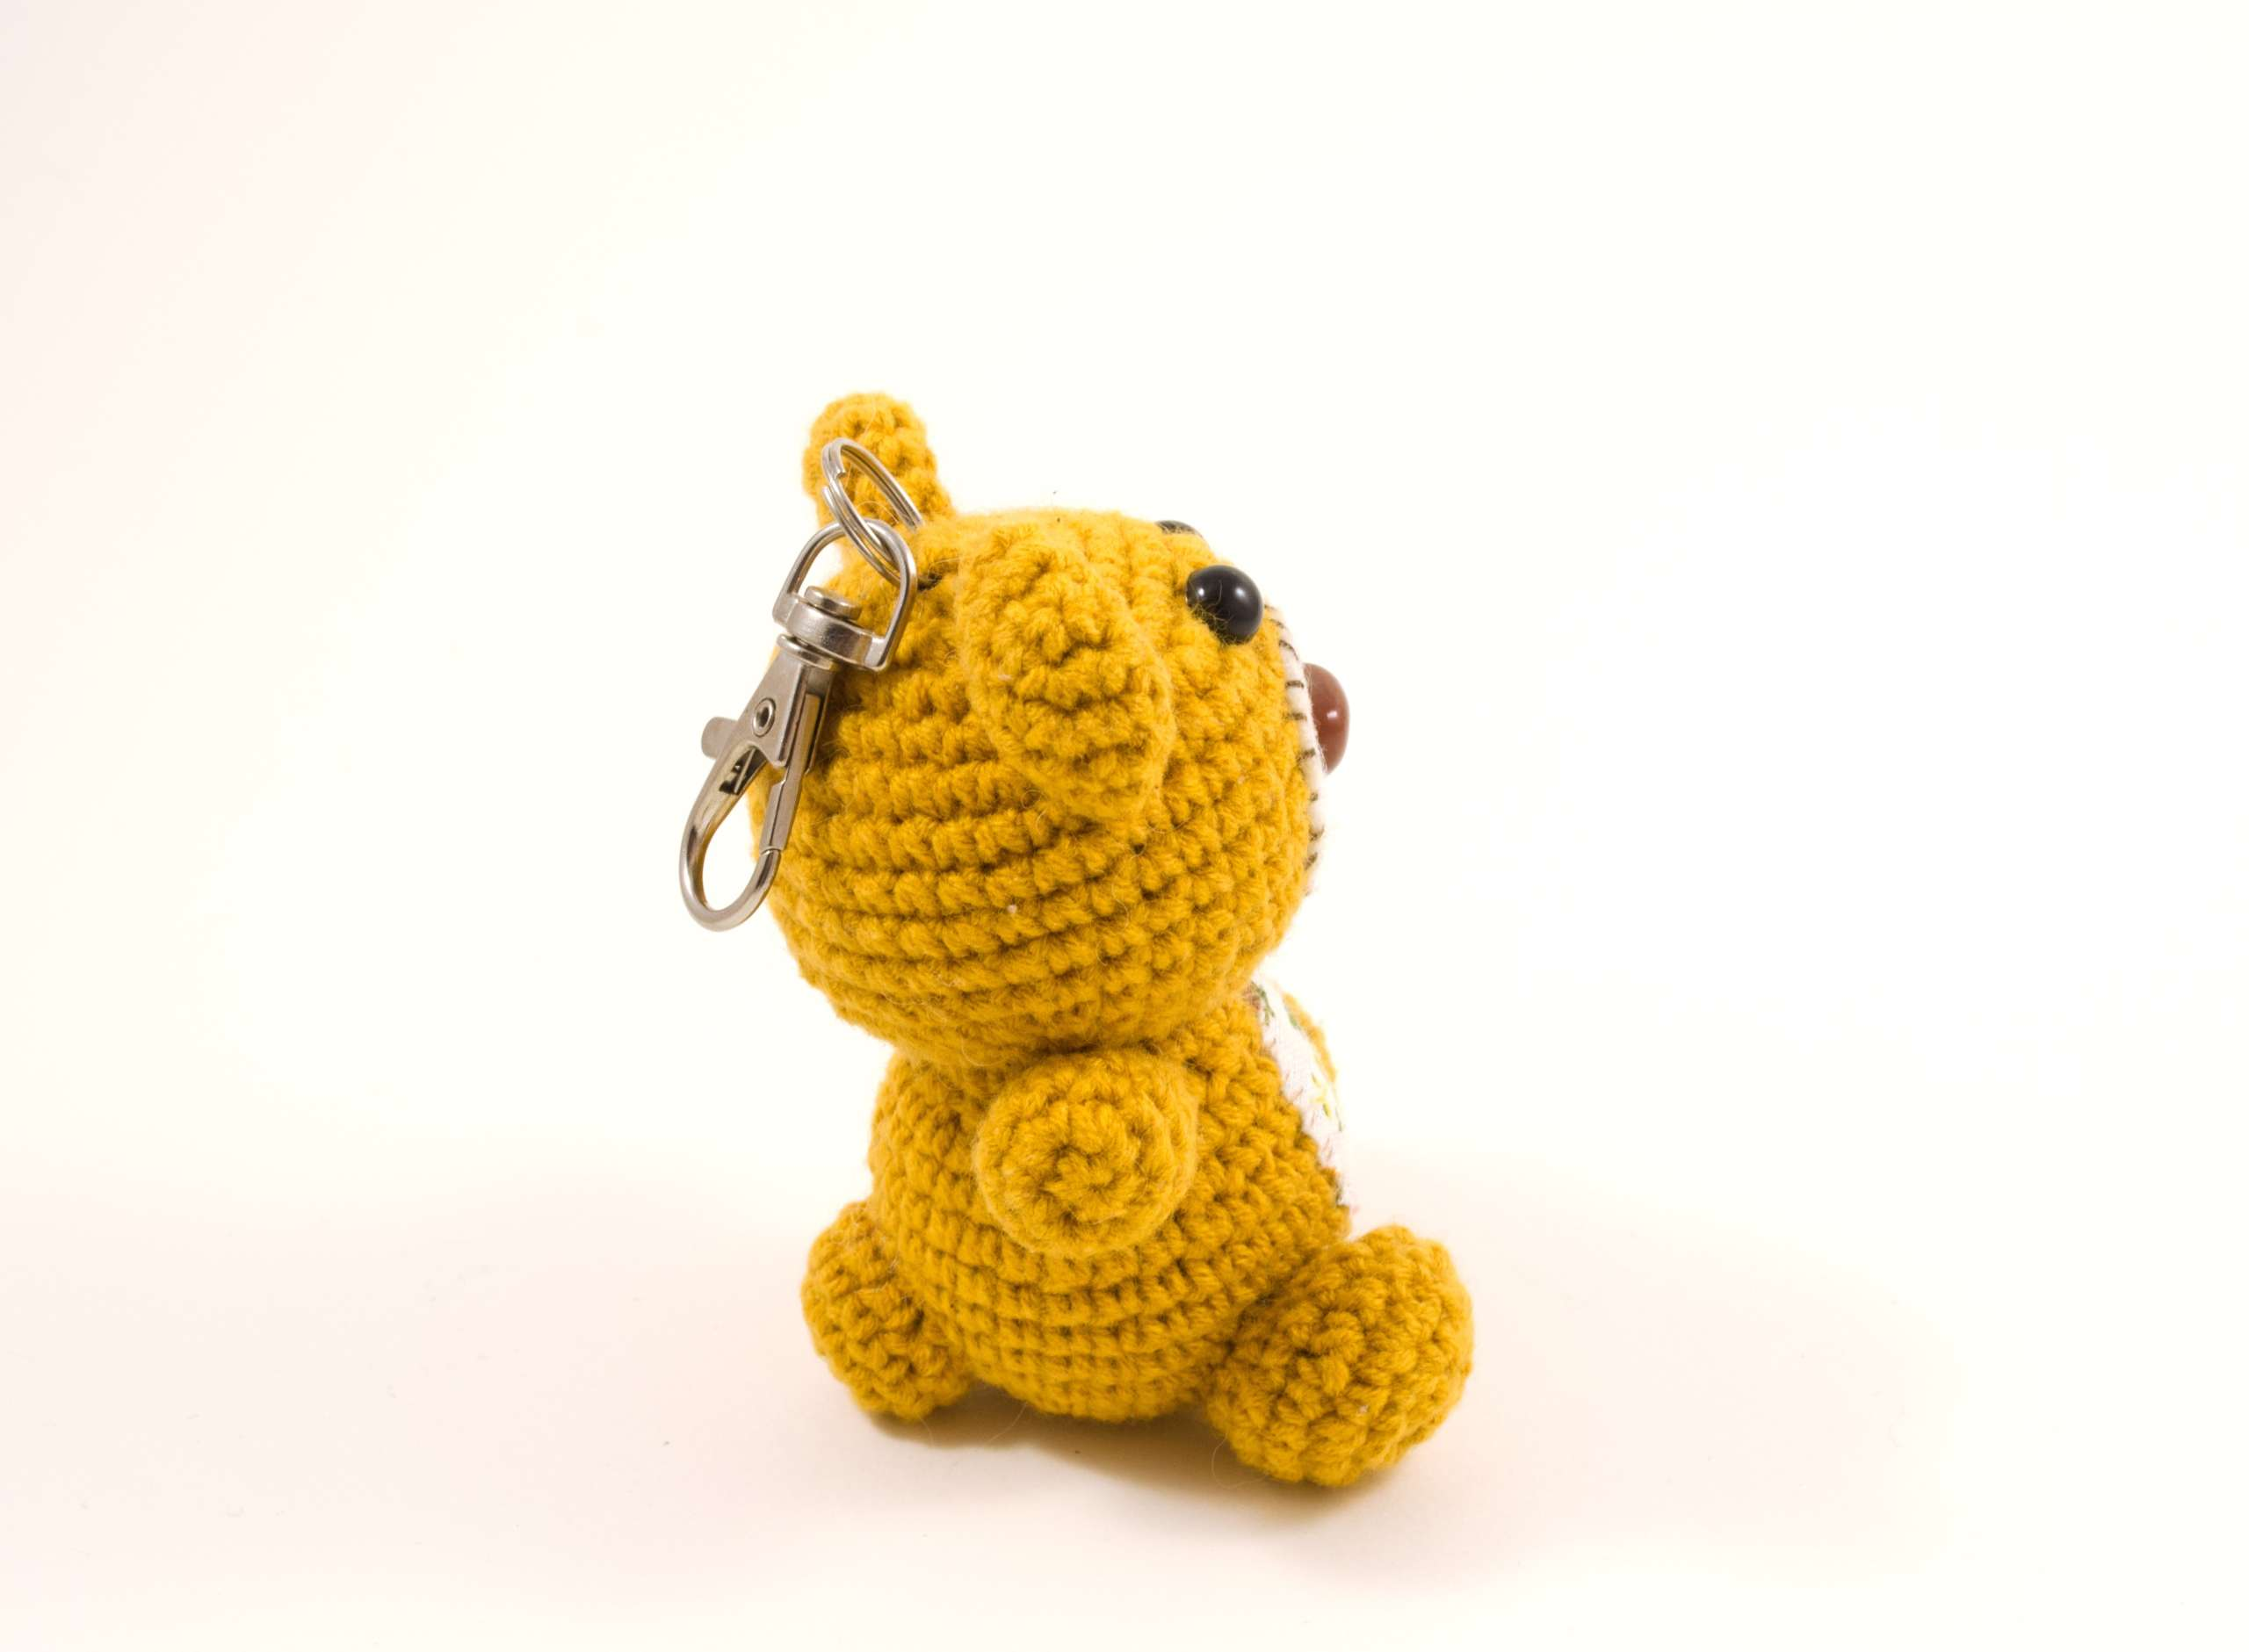 crochet teddy bear keyrin side view